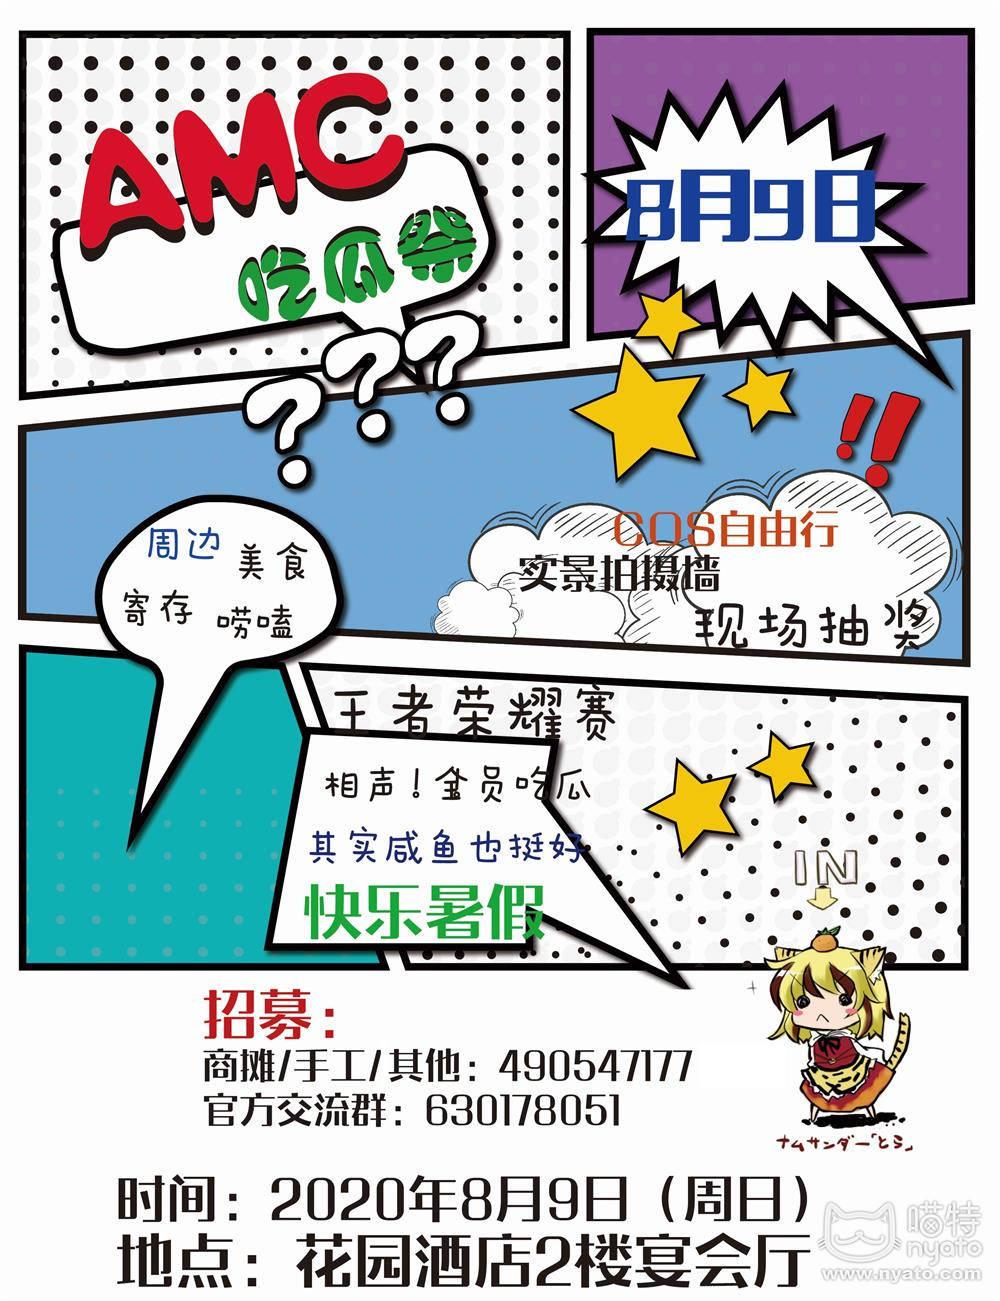 AMC漫展海报-8.9.jpg